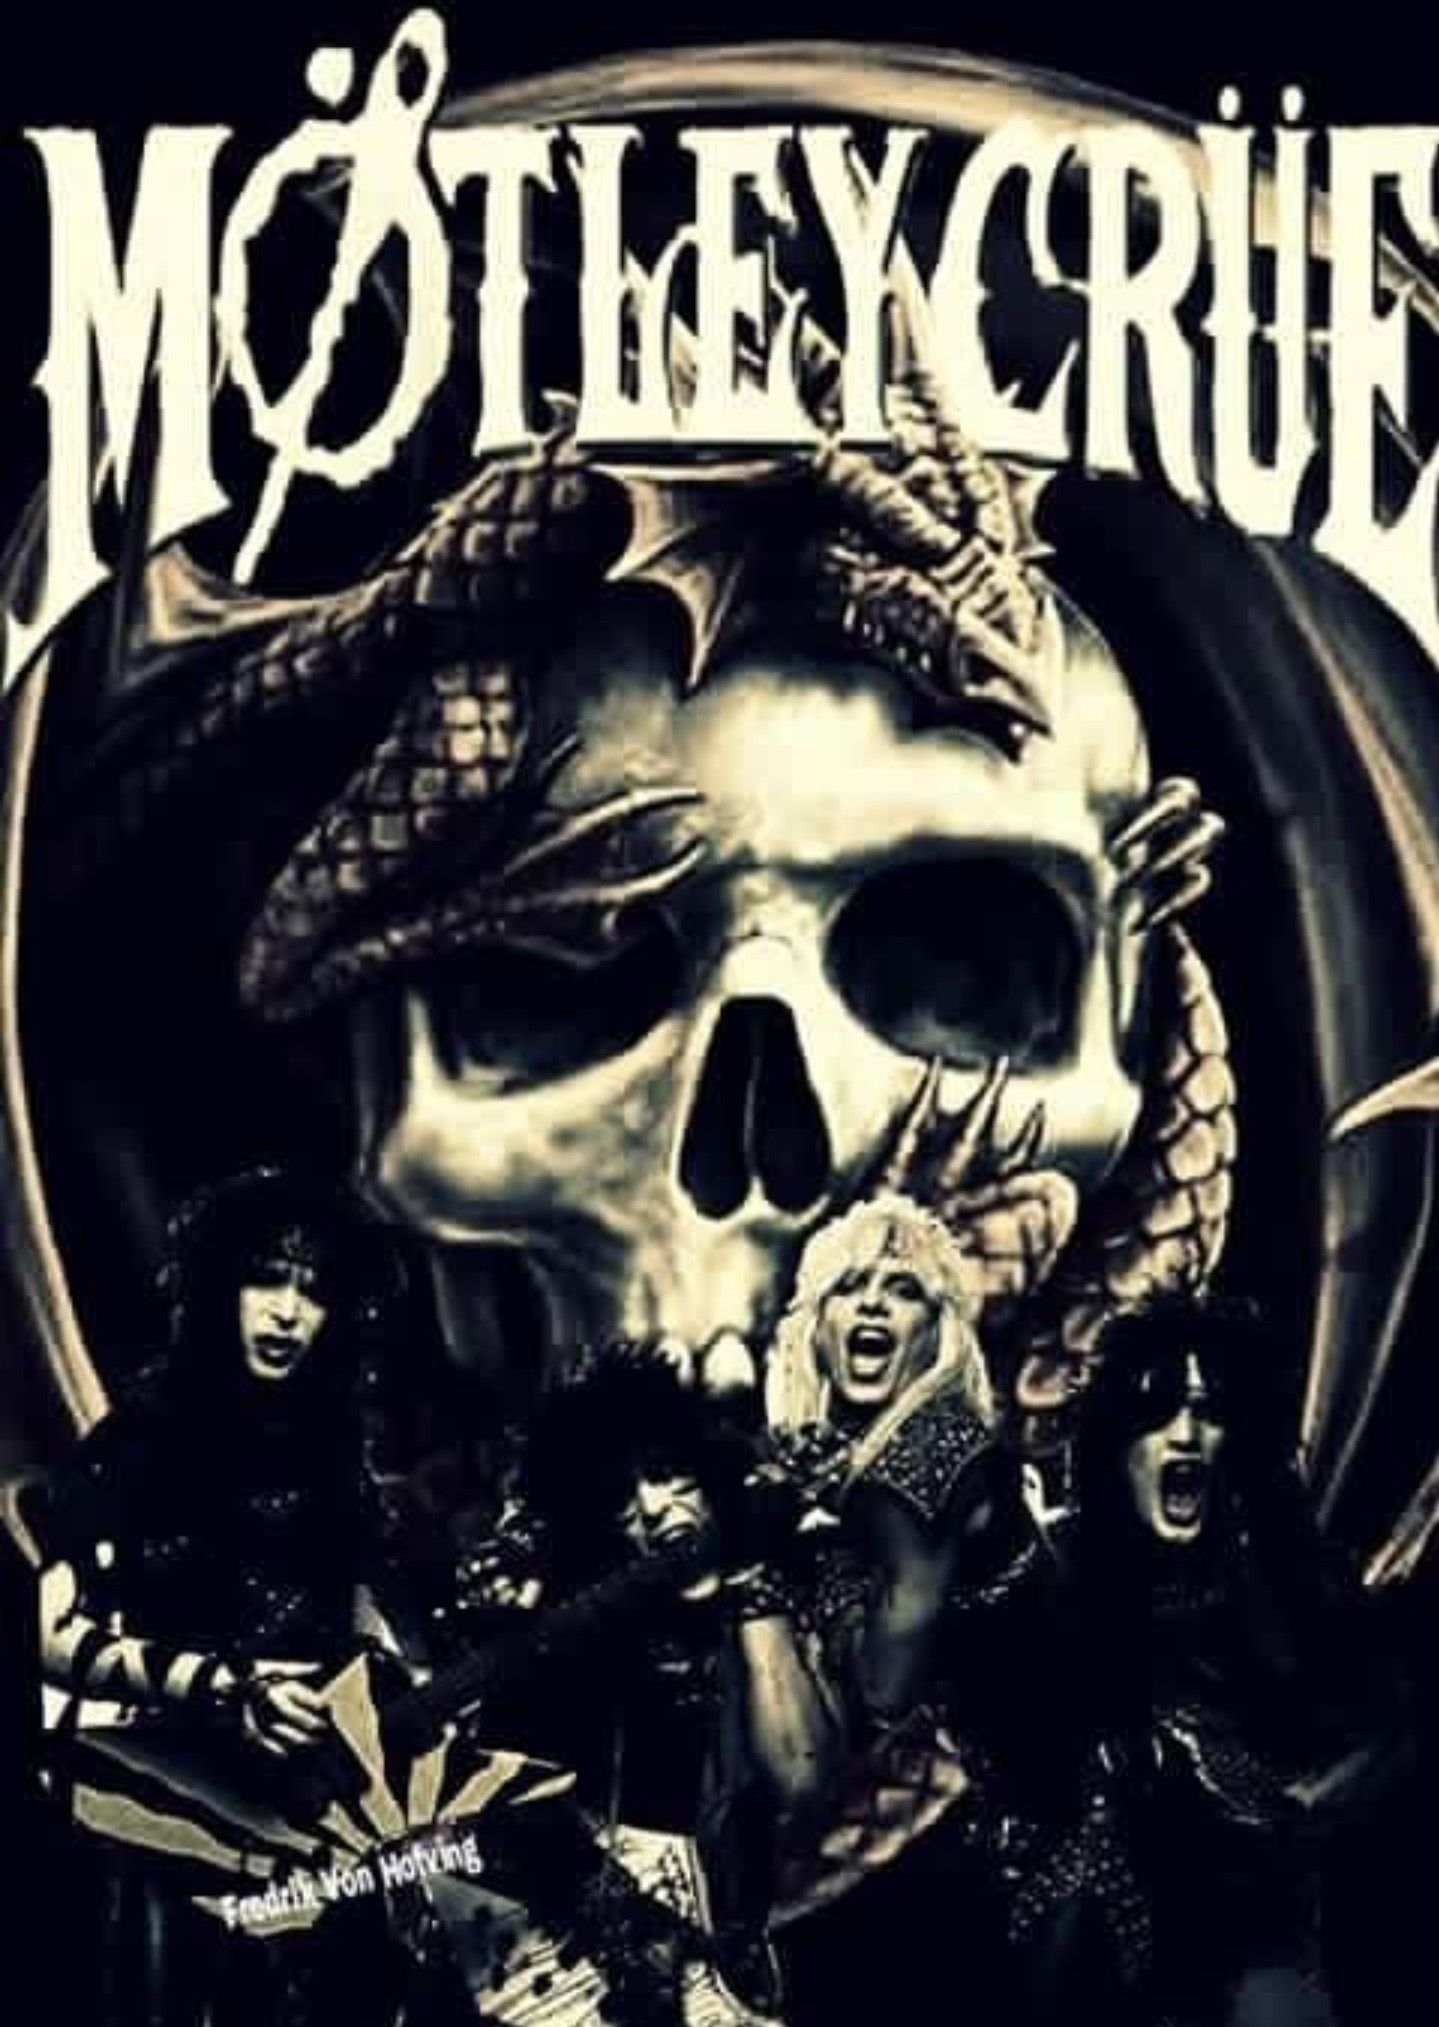 Motley Crue Motley crue albums, Motley crue, Glam metal